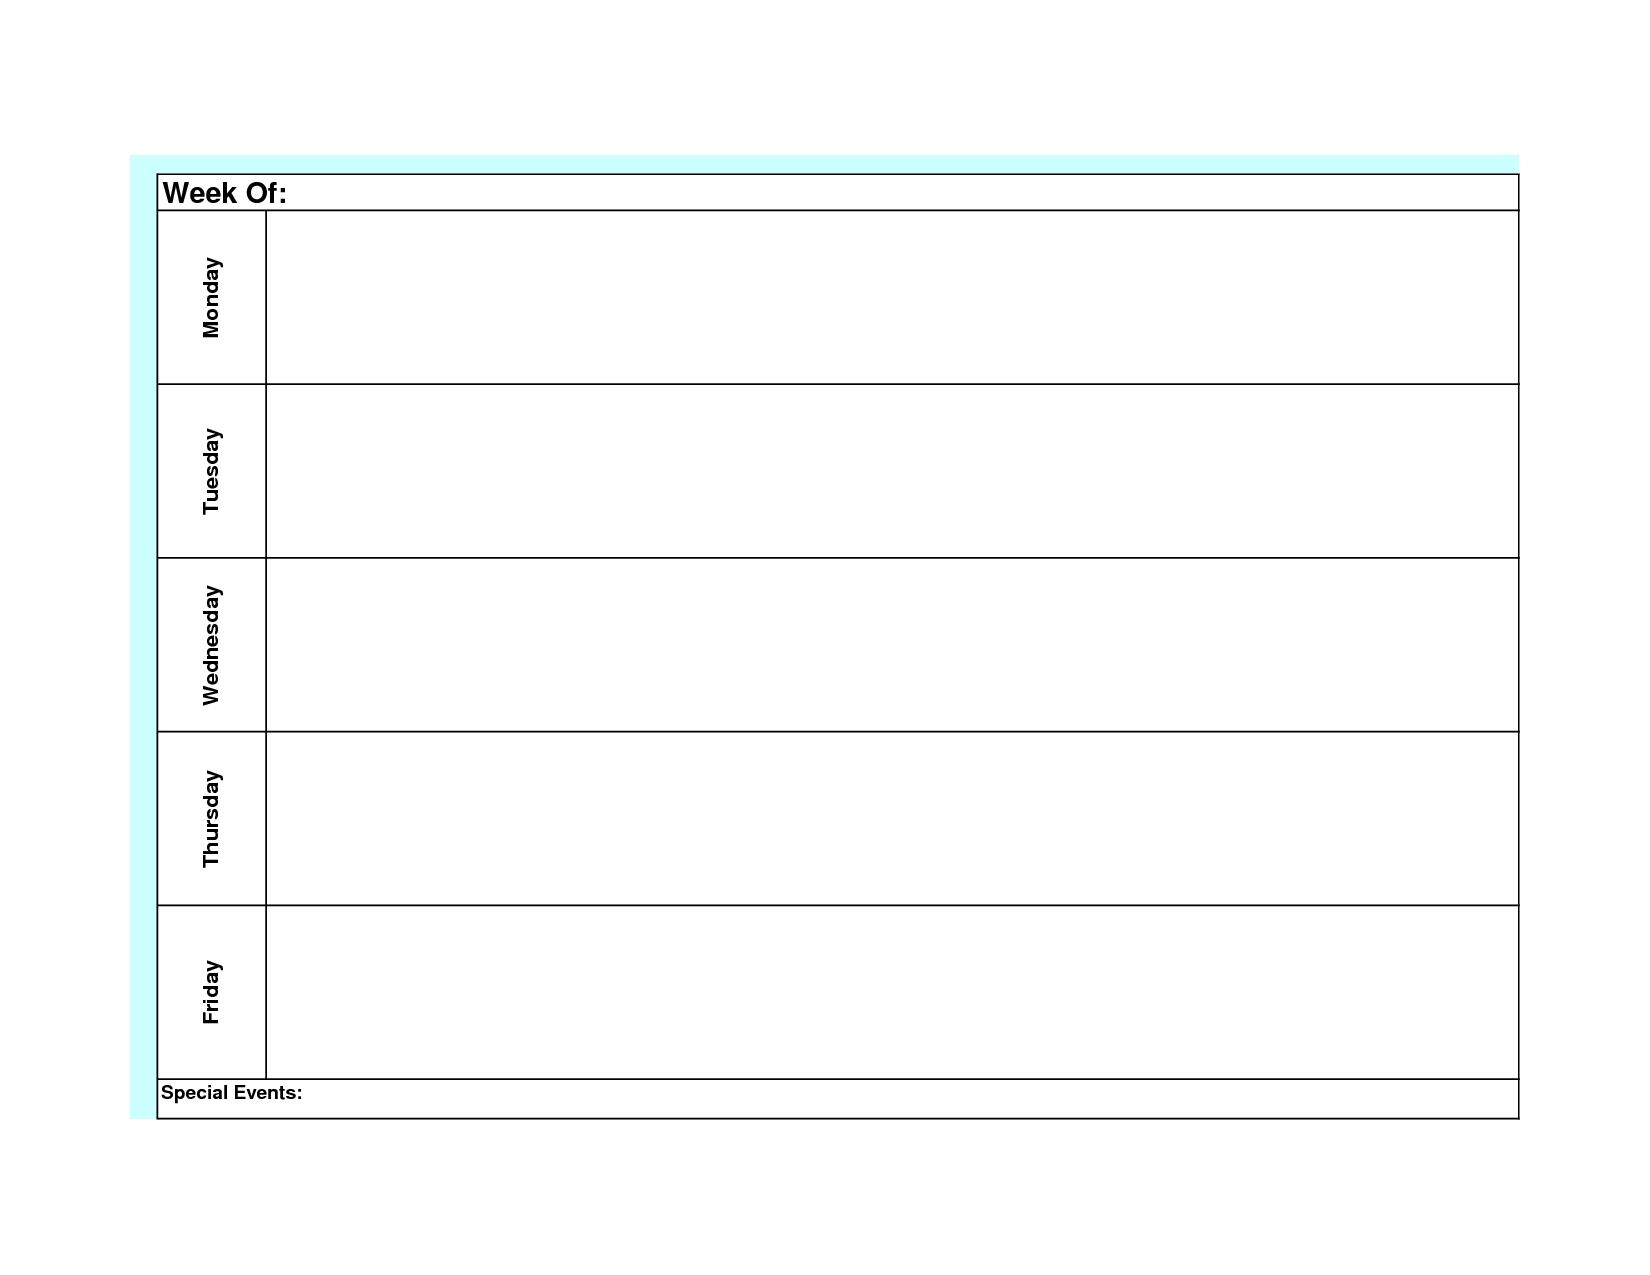 Blank Weekly Calendar Template Monday Friday | School-Mon To Friday Monthly Calendar Templates